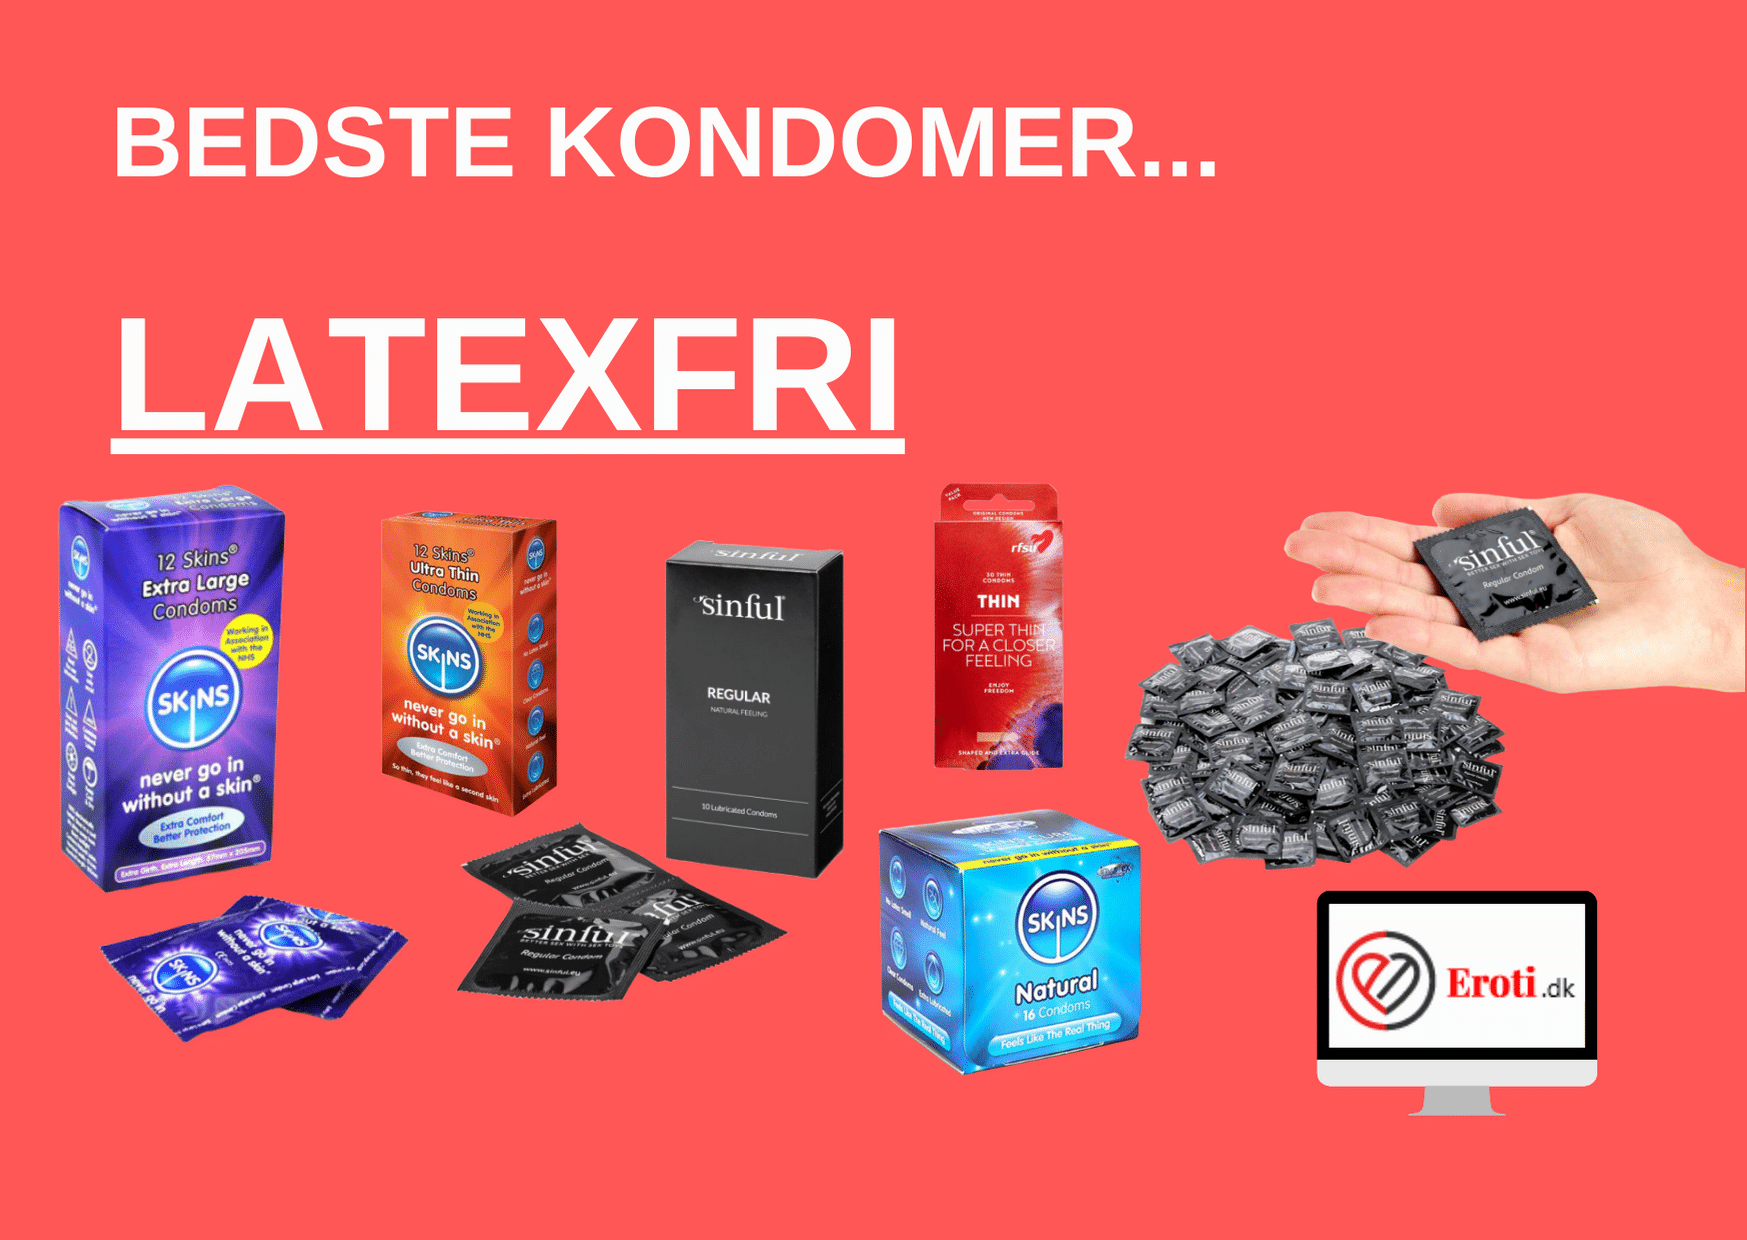 latexfri kondomer